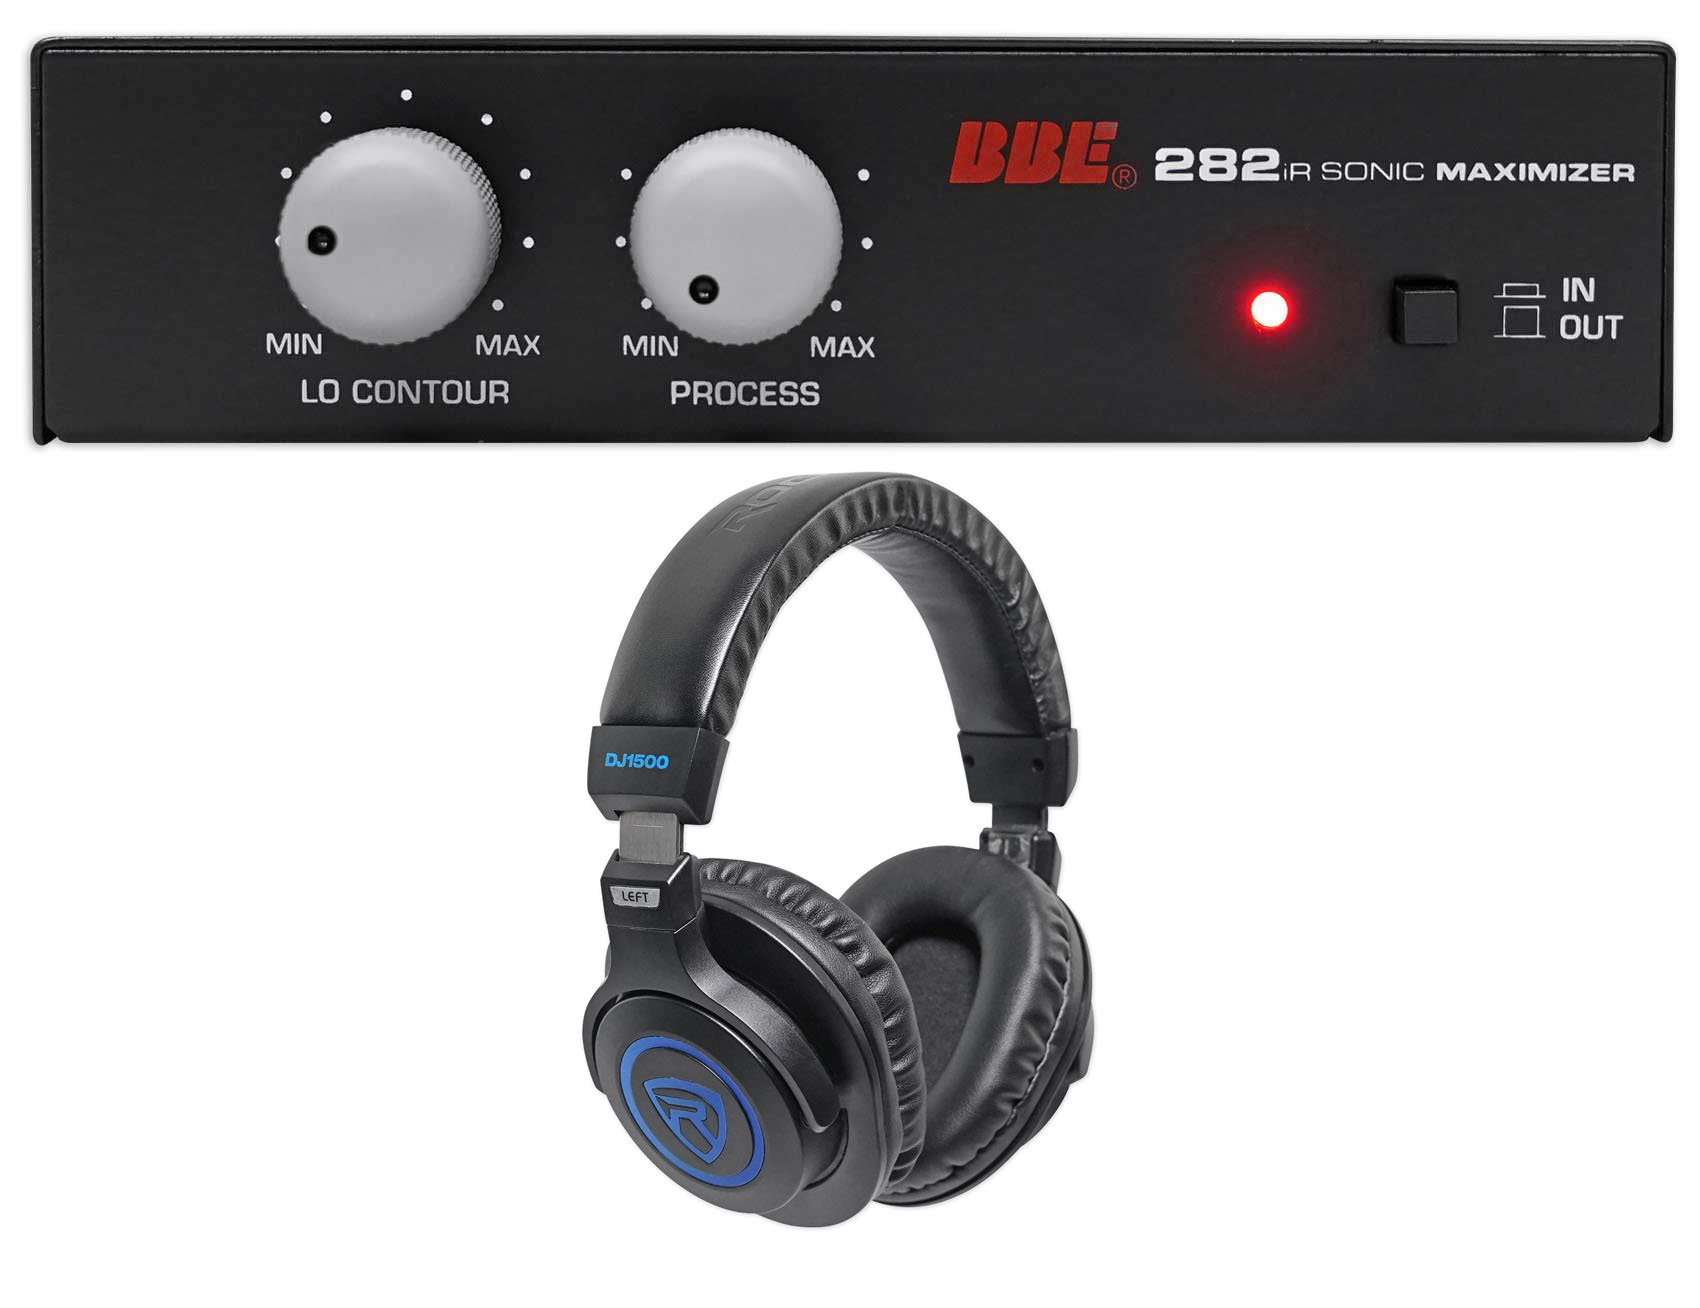 BBE 282IR Desktop Sonic Maximizer w/RCA Inputs/Outputs + Free Headphones